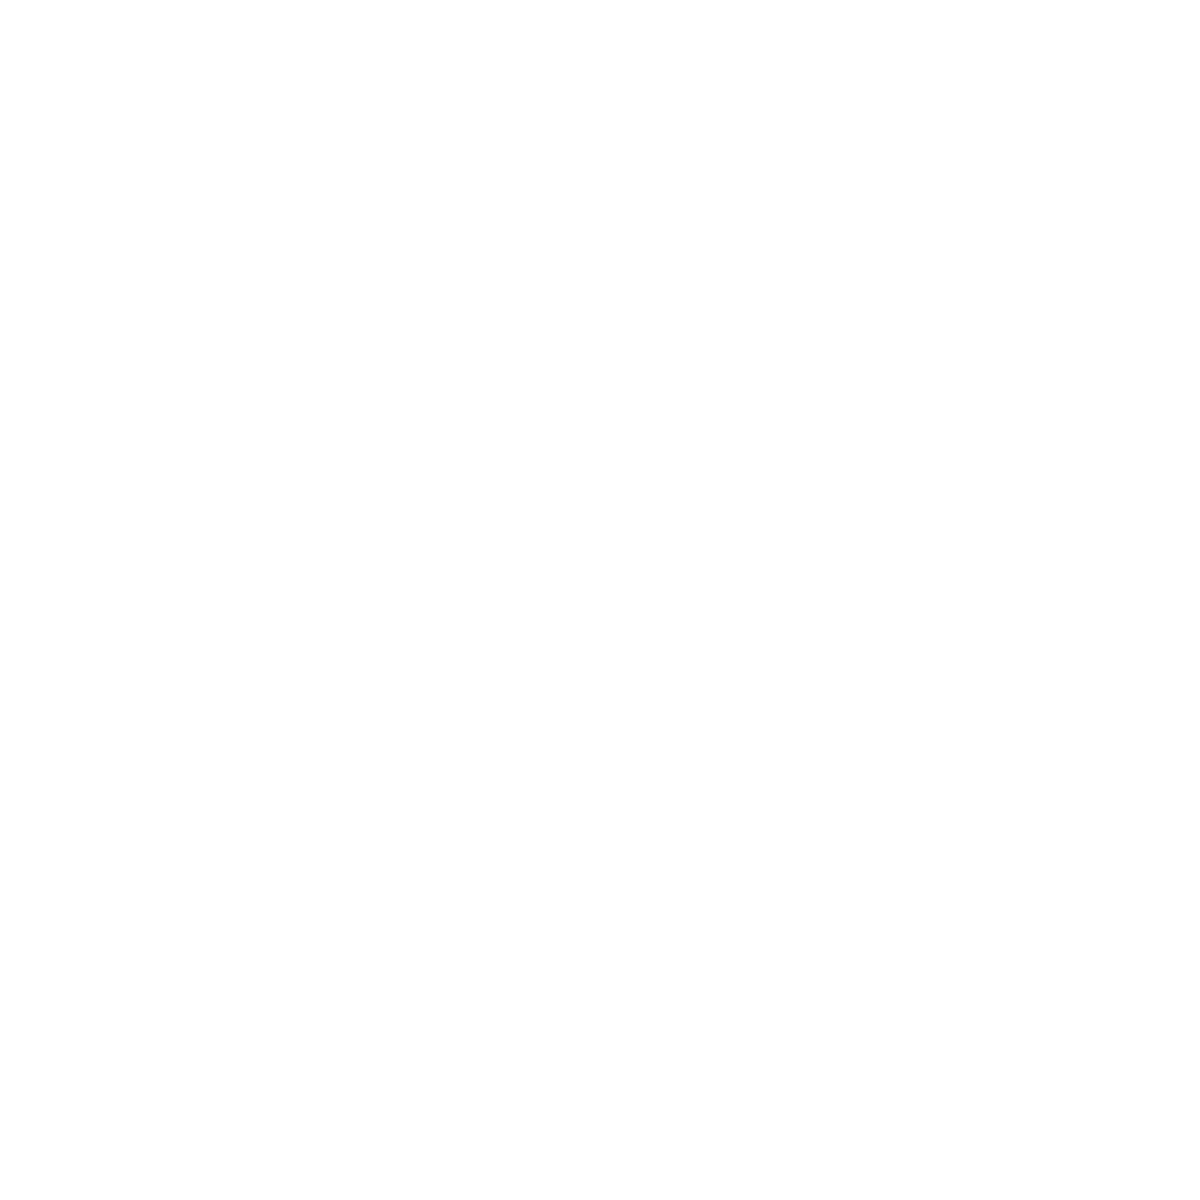 16100011